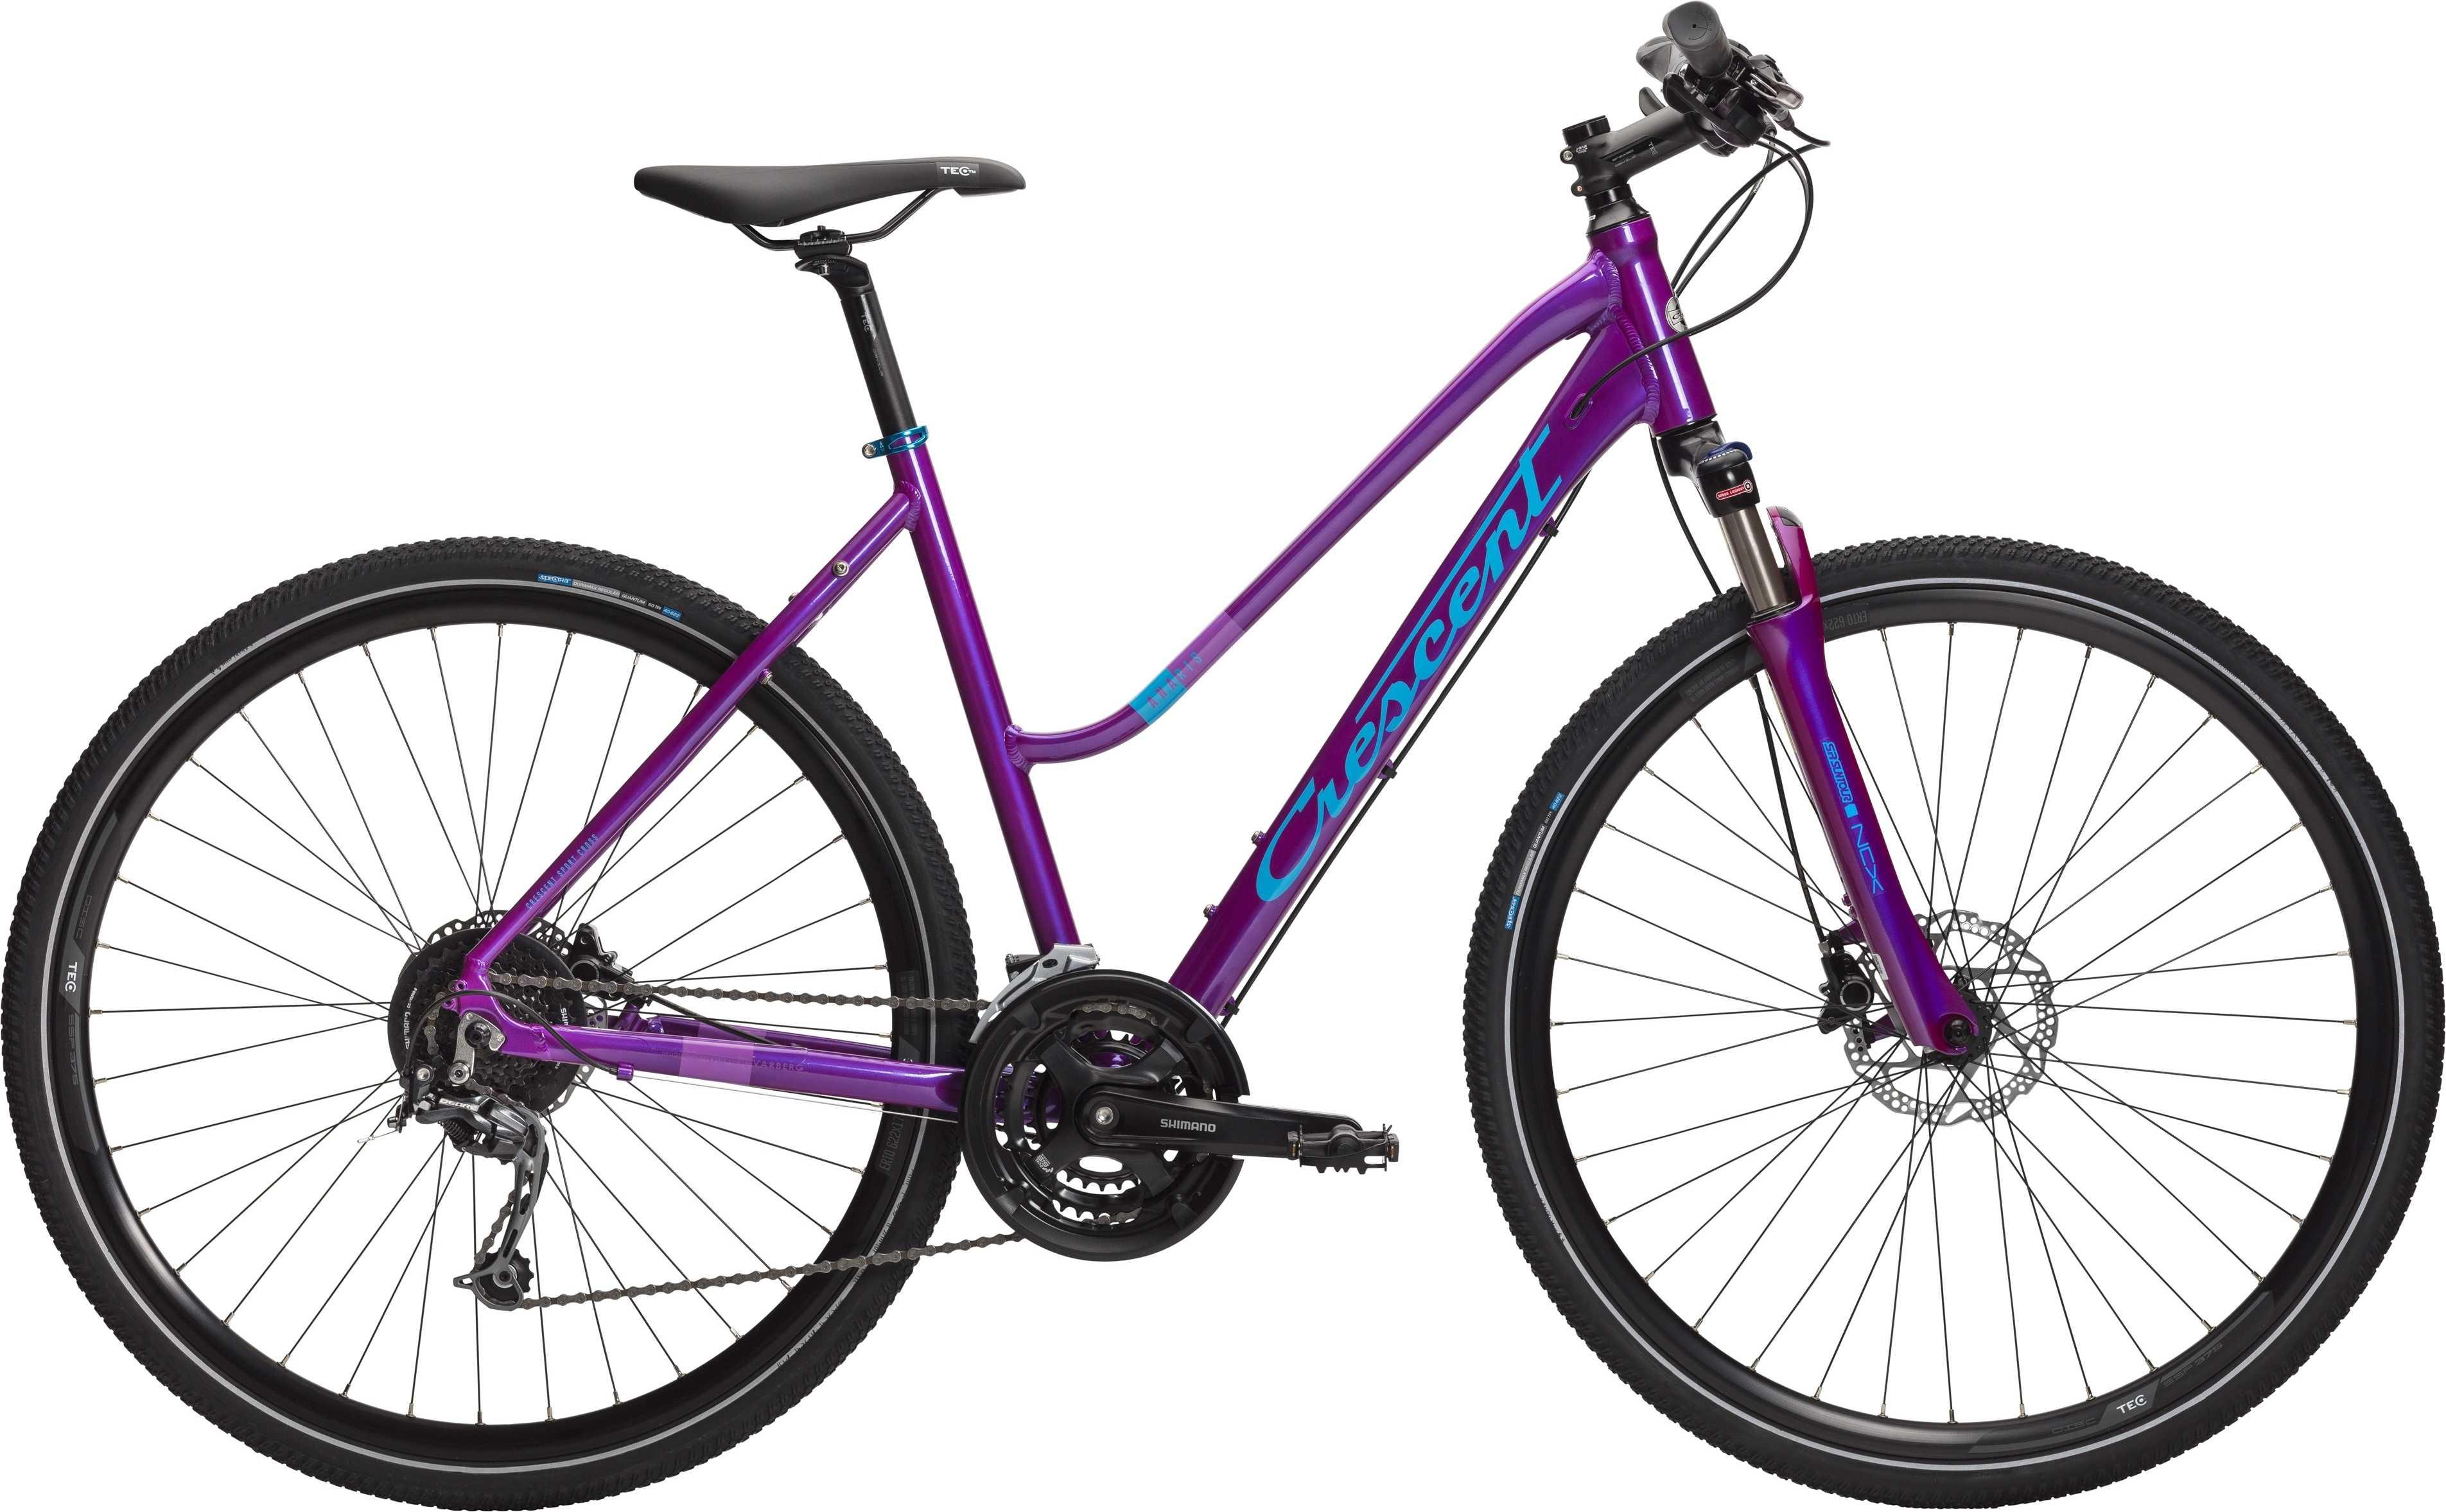 CRESCENT ANARIS LILLA METALLIC | City-cykler